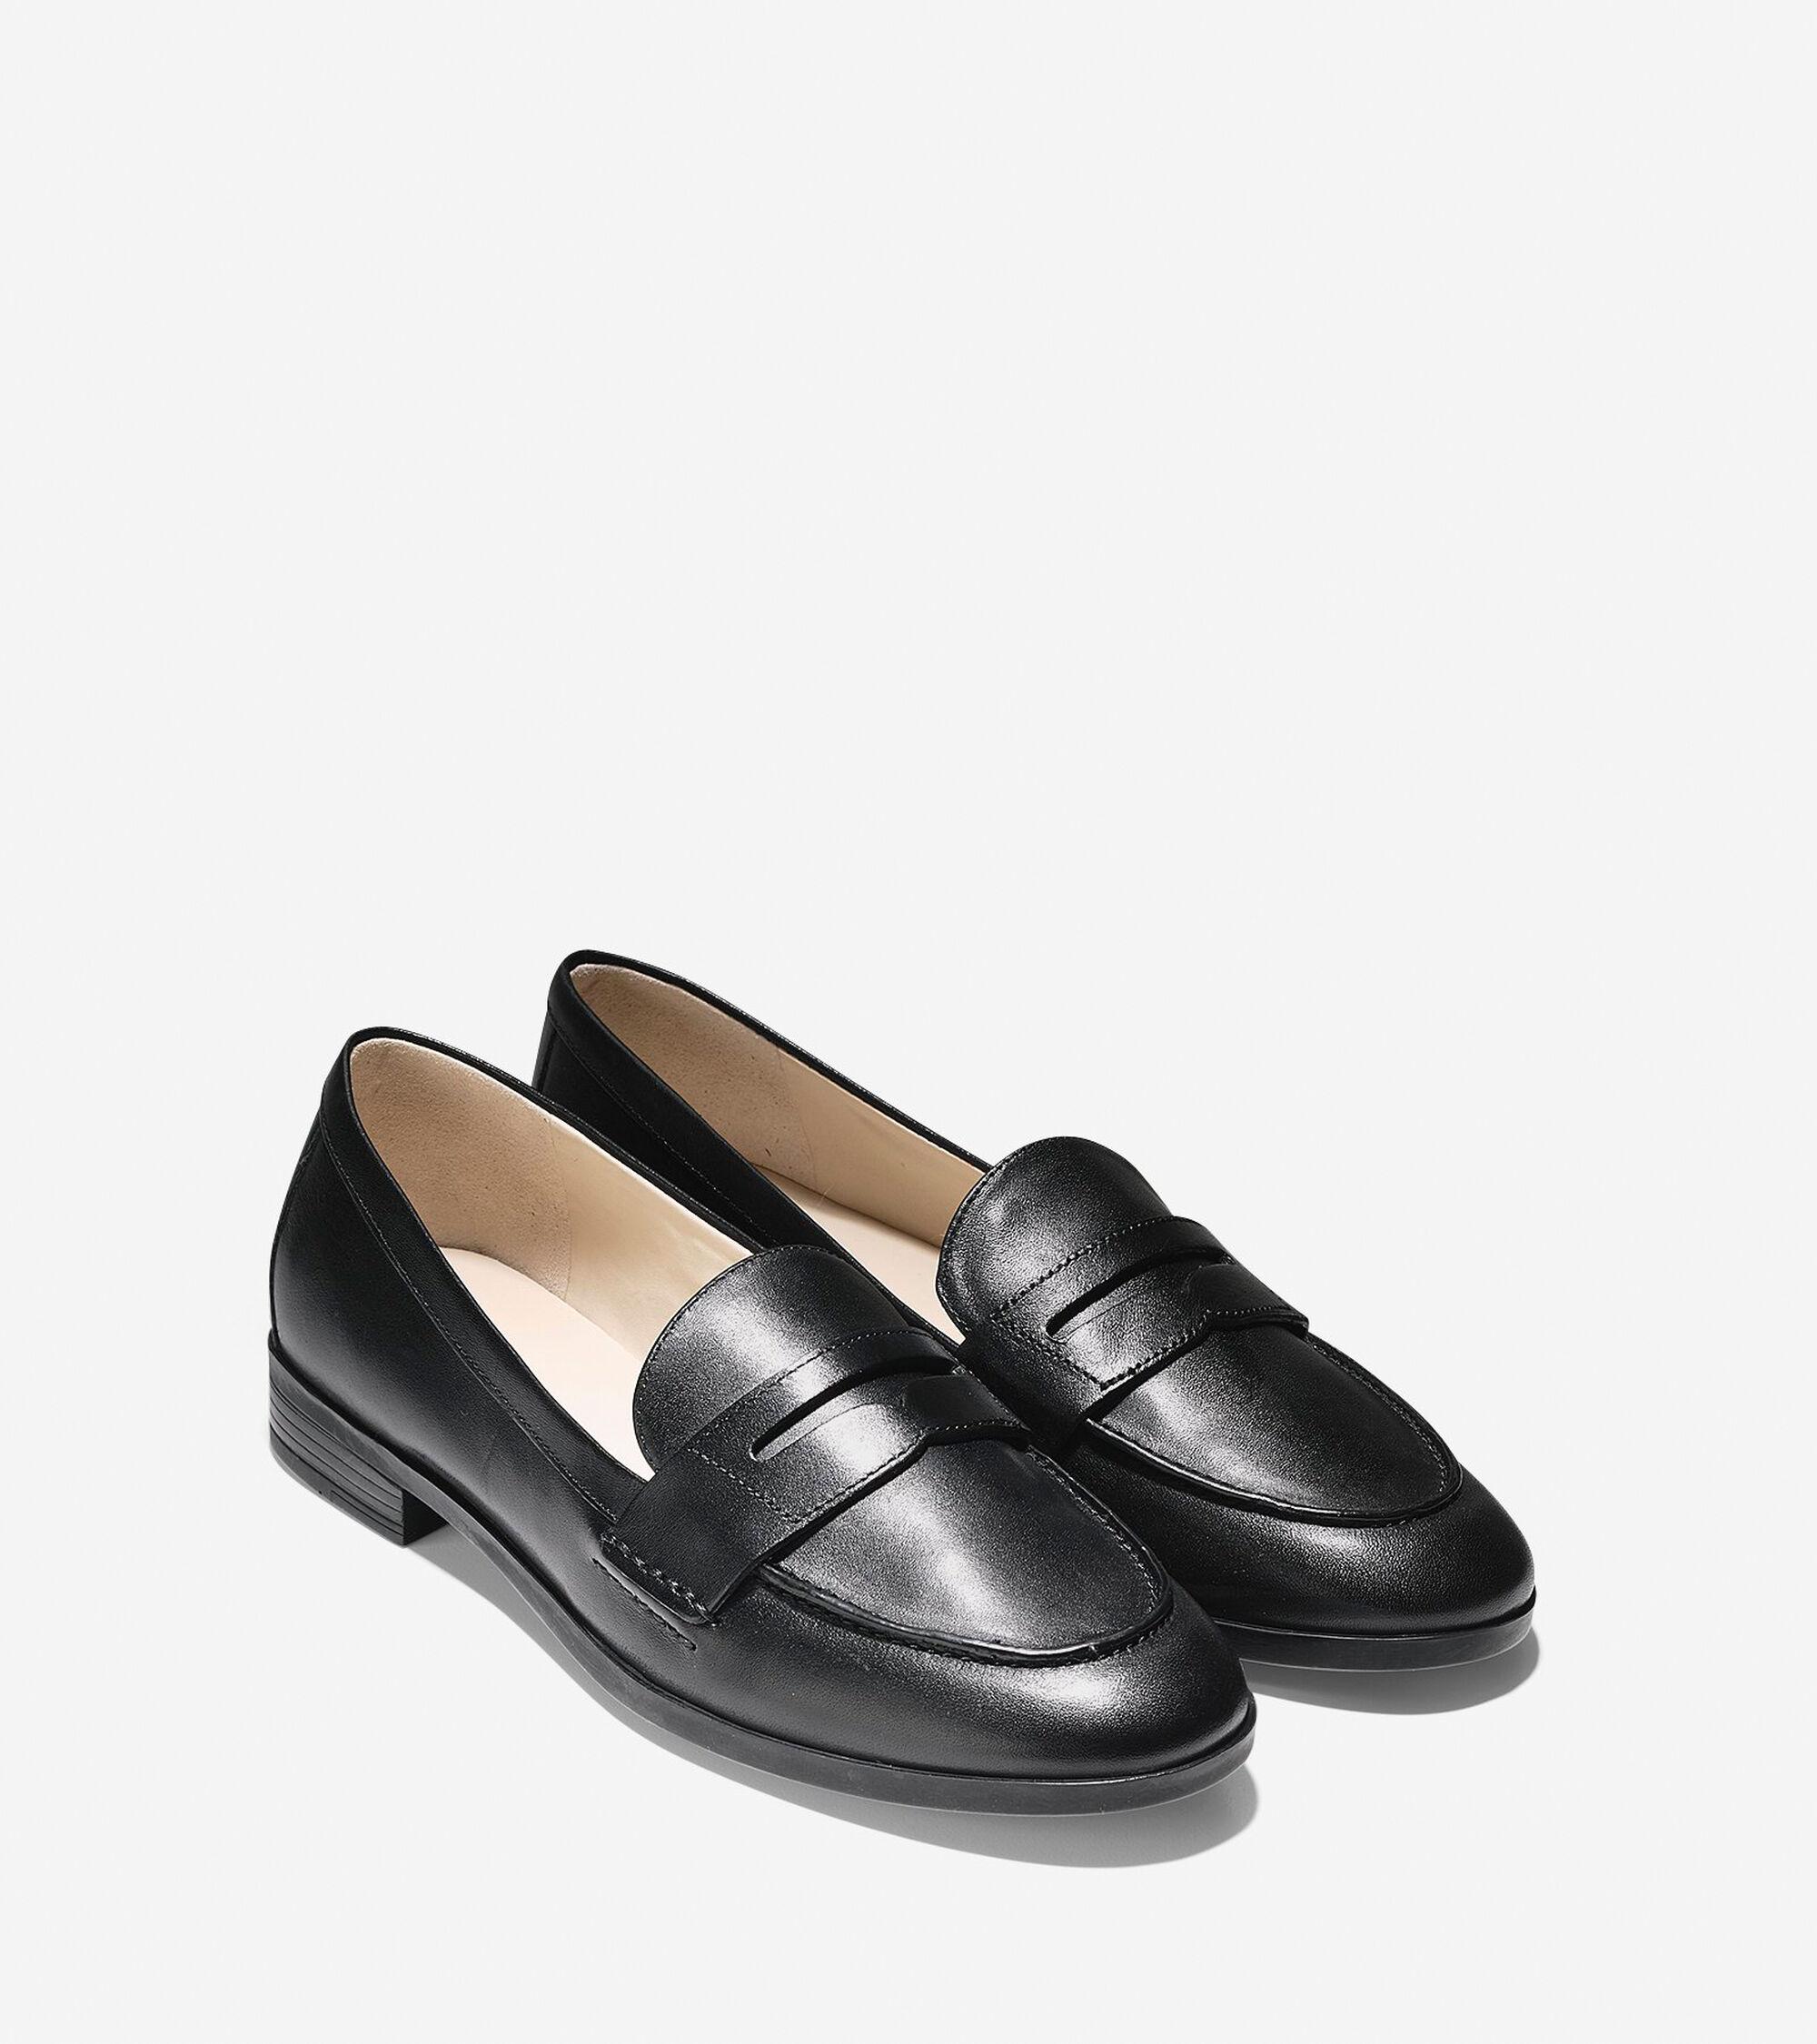 b661258b5b1 Women s Pinch Grand Penny Loafers in Black